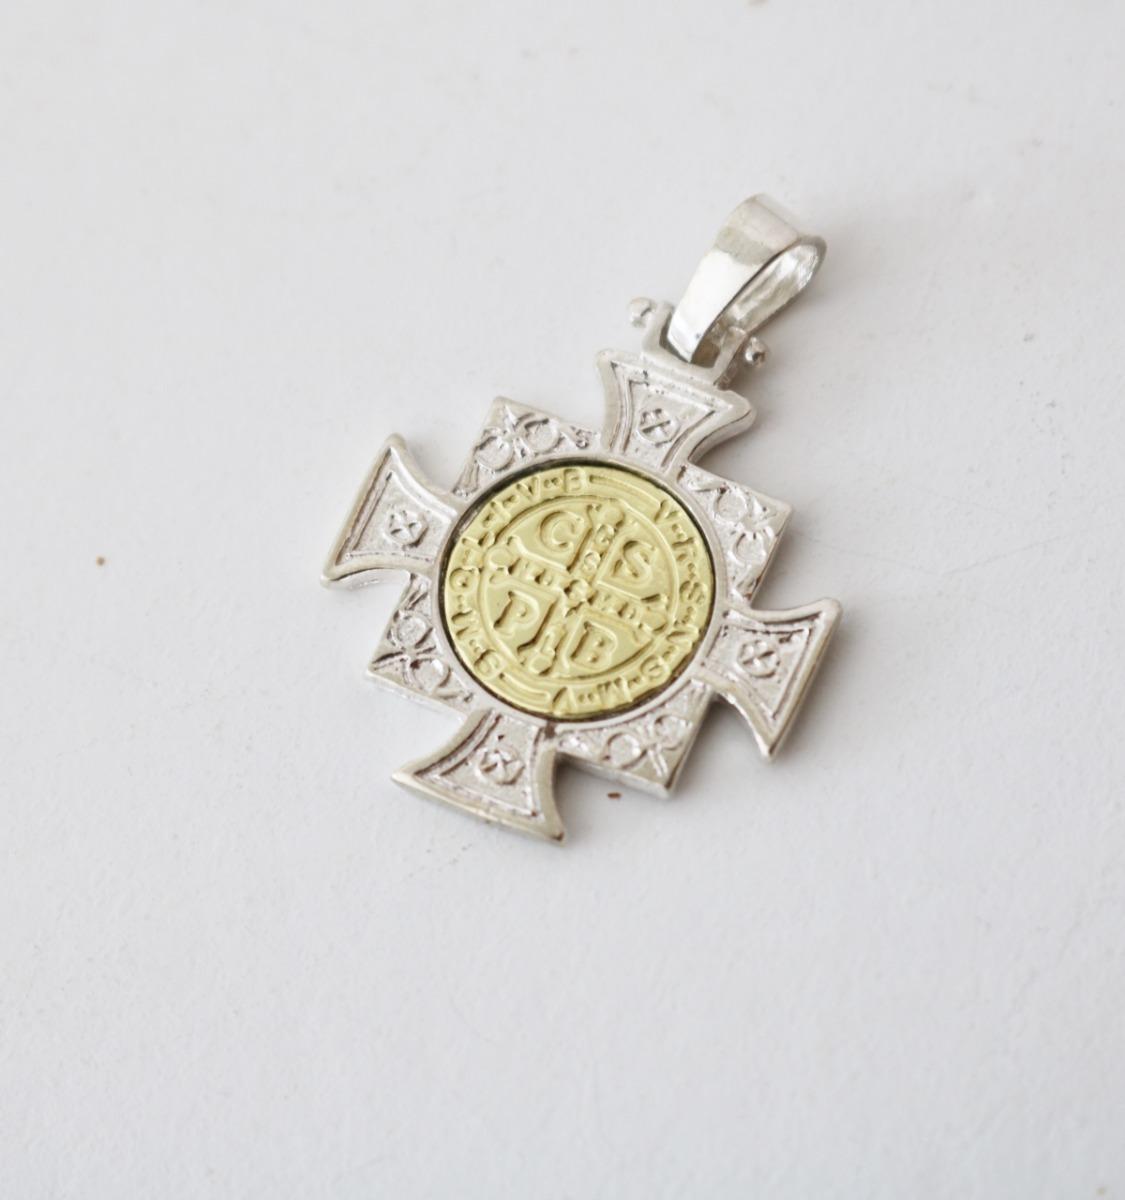 d7985ab7fb0 dije medalla cruz san benito plata 925 oro 18k garantia. Cargando zoom.